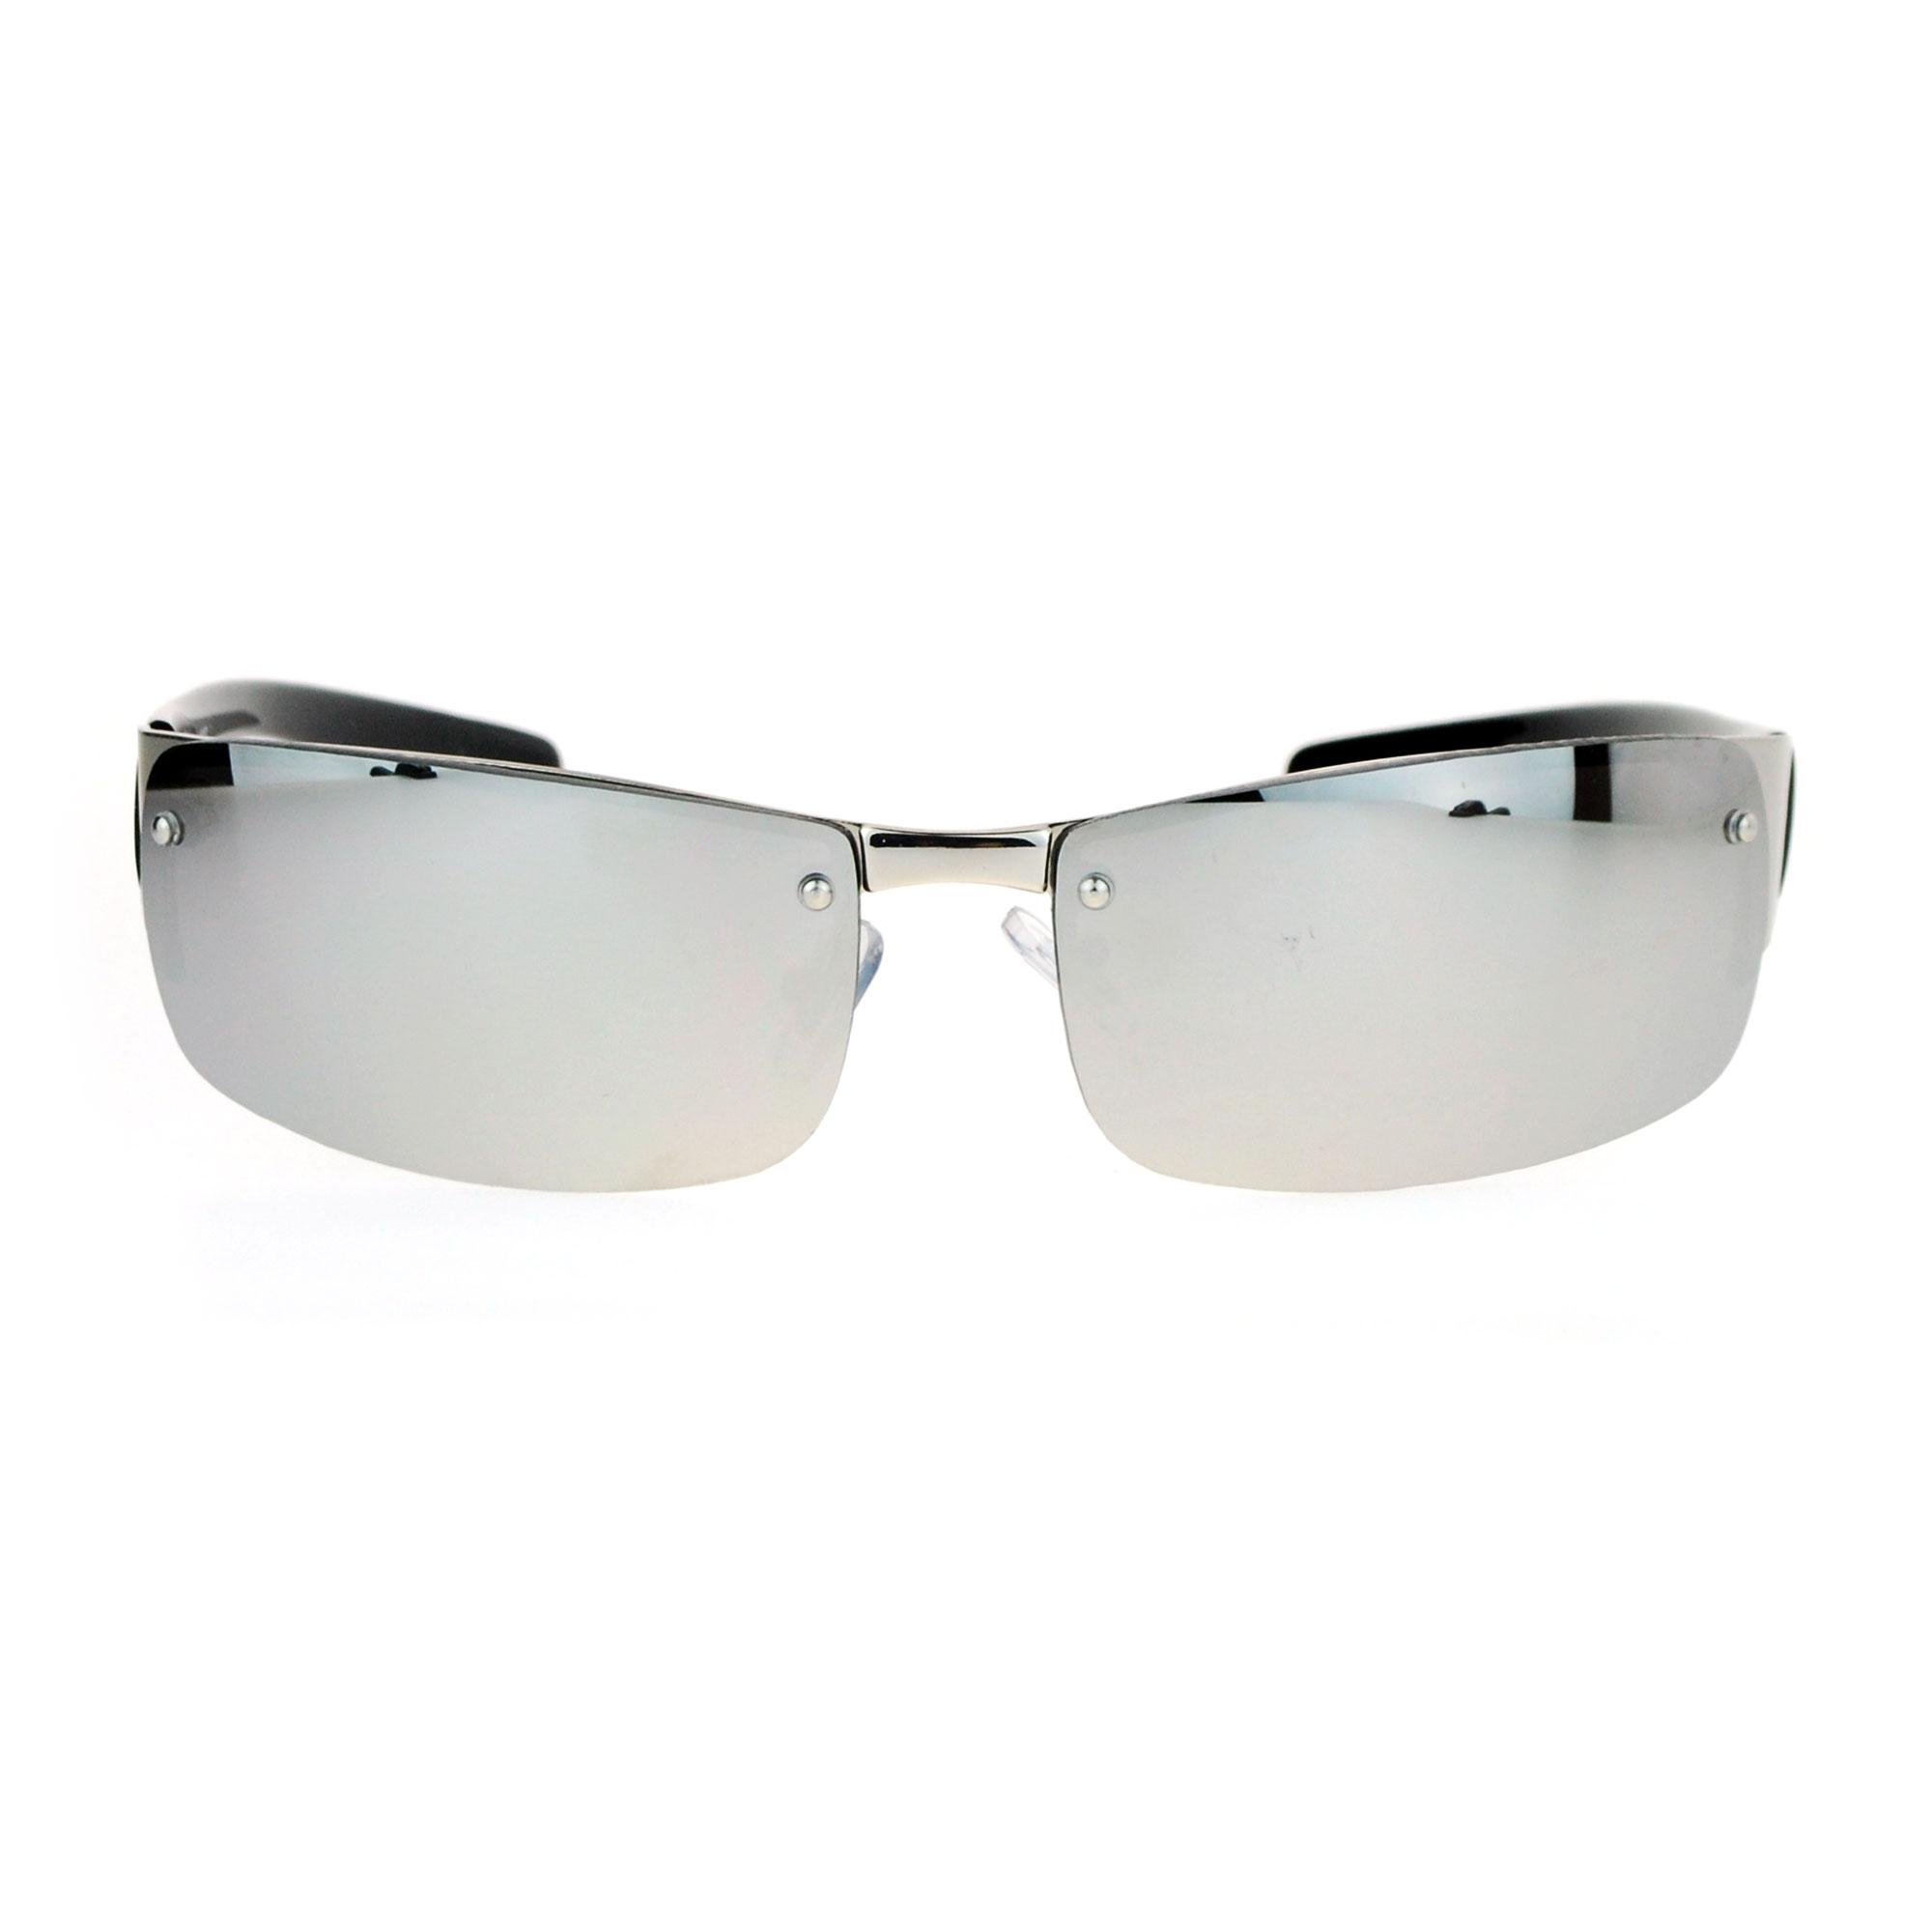 9607a0b75e5 Luxury Sunglasses Mens